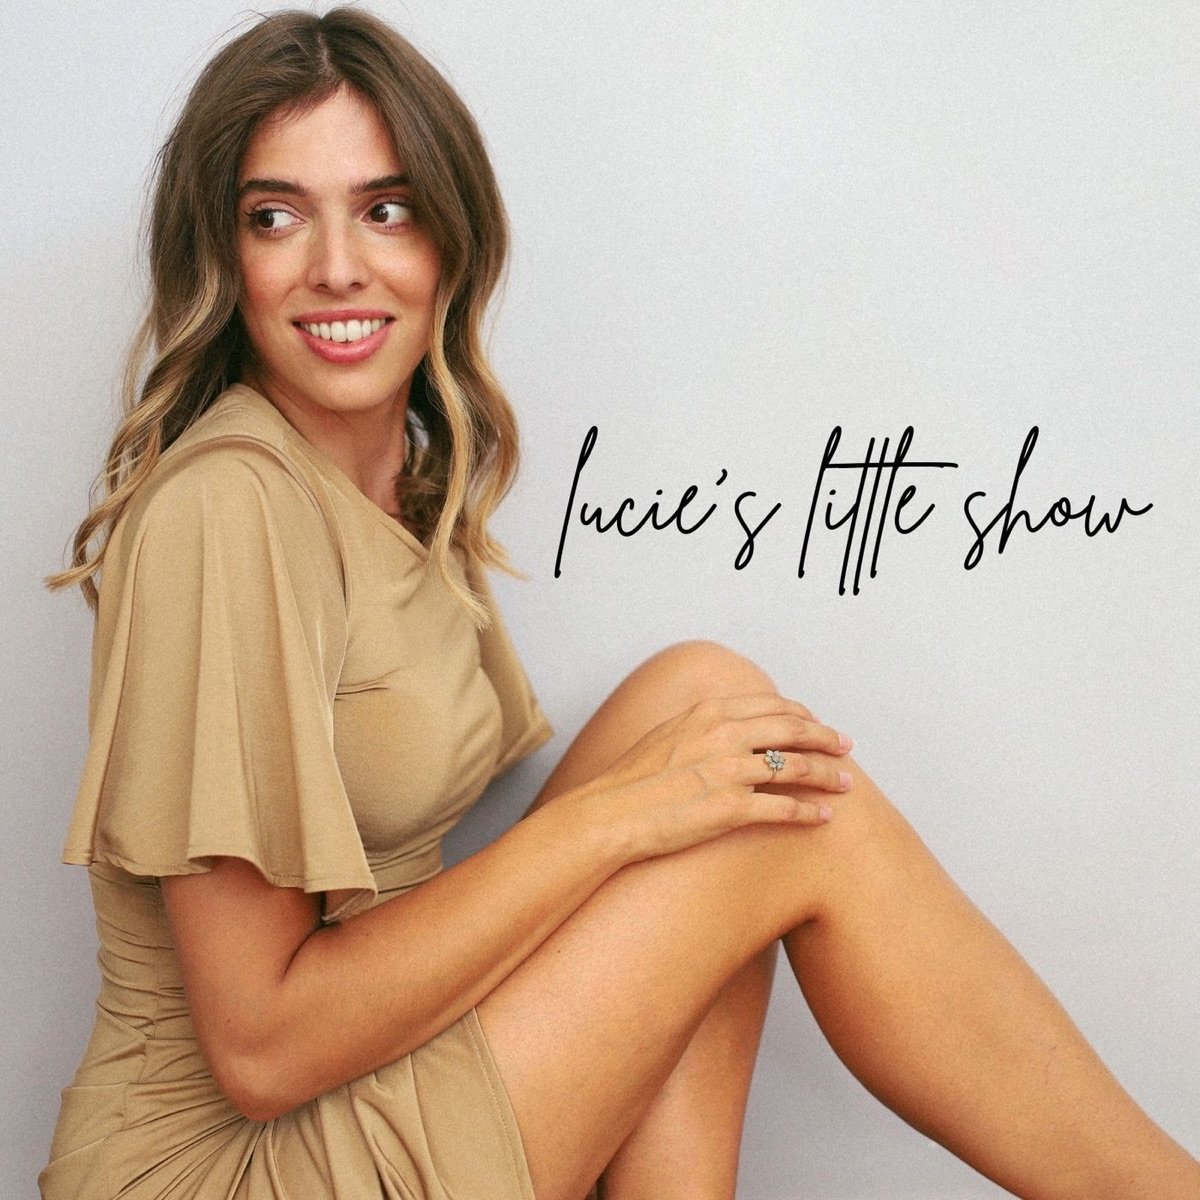 Lucie's Little Show